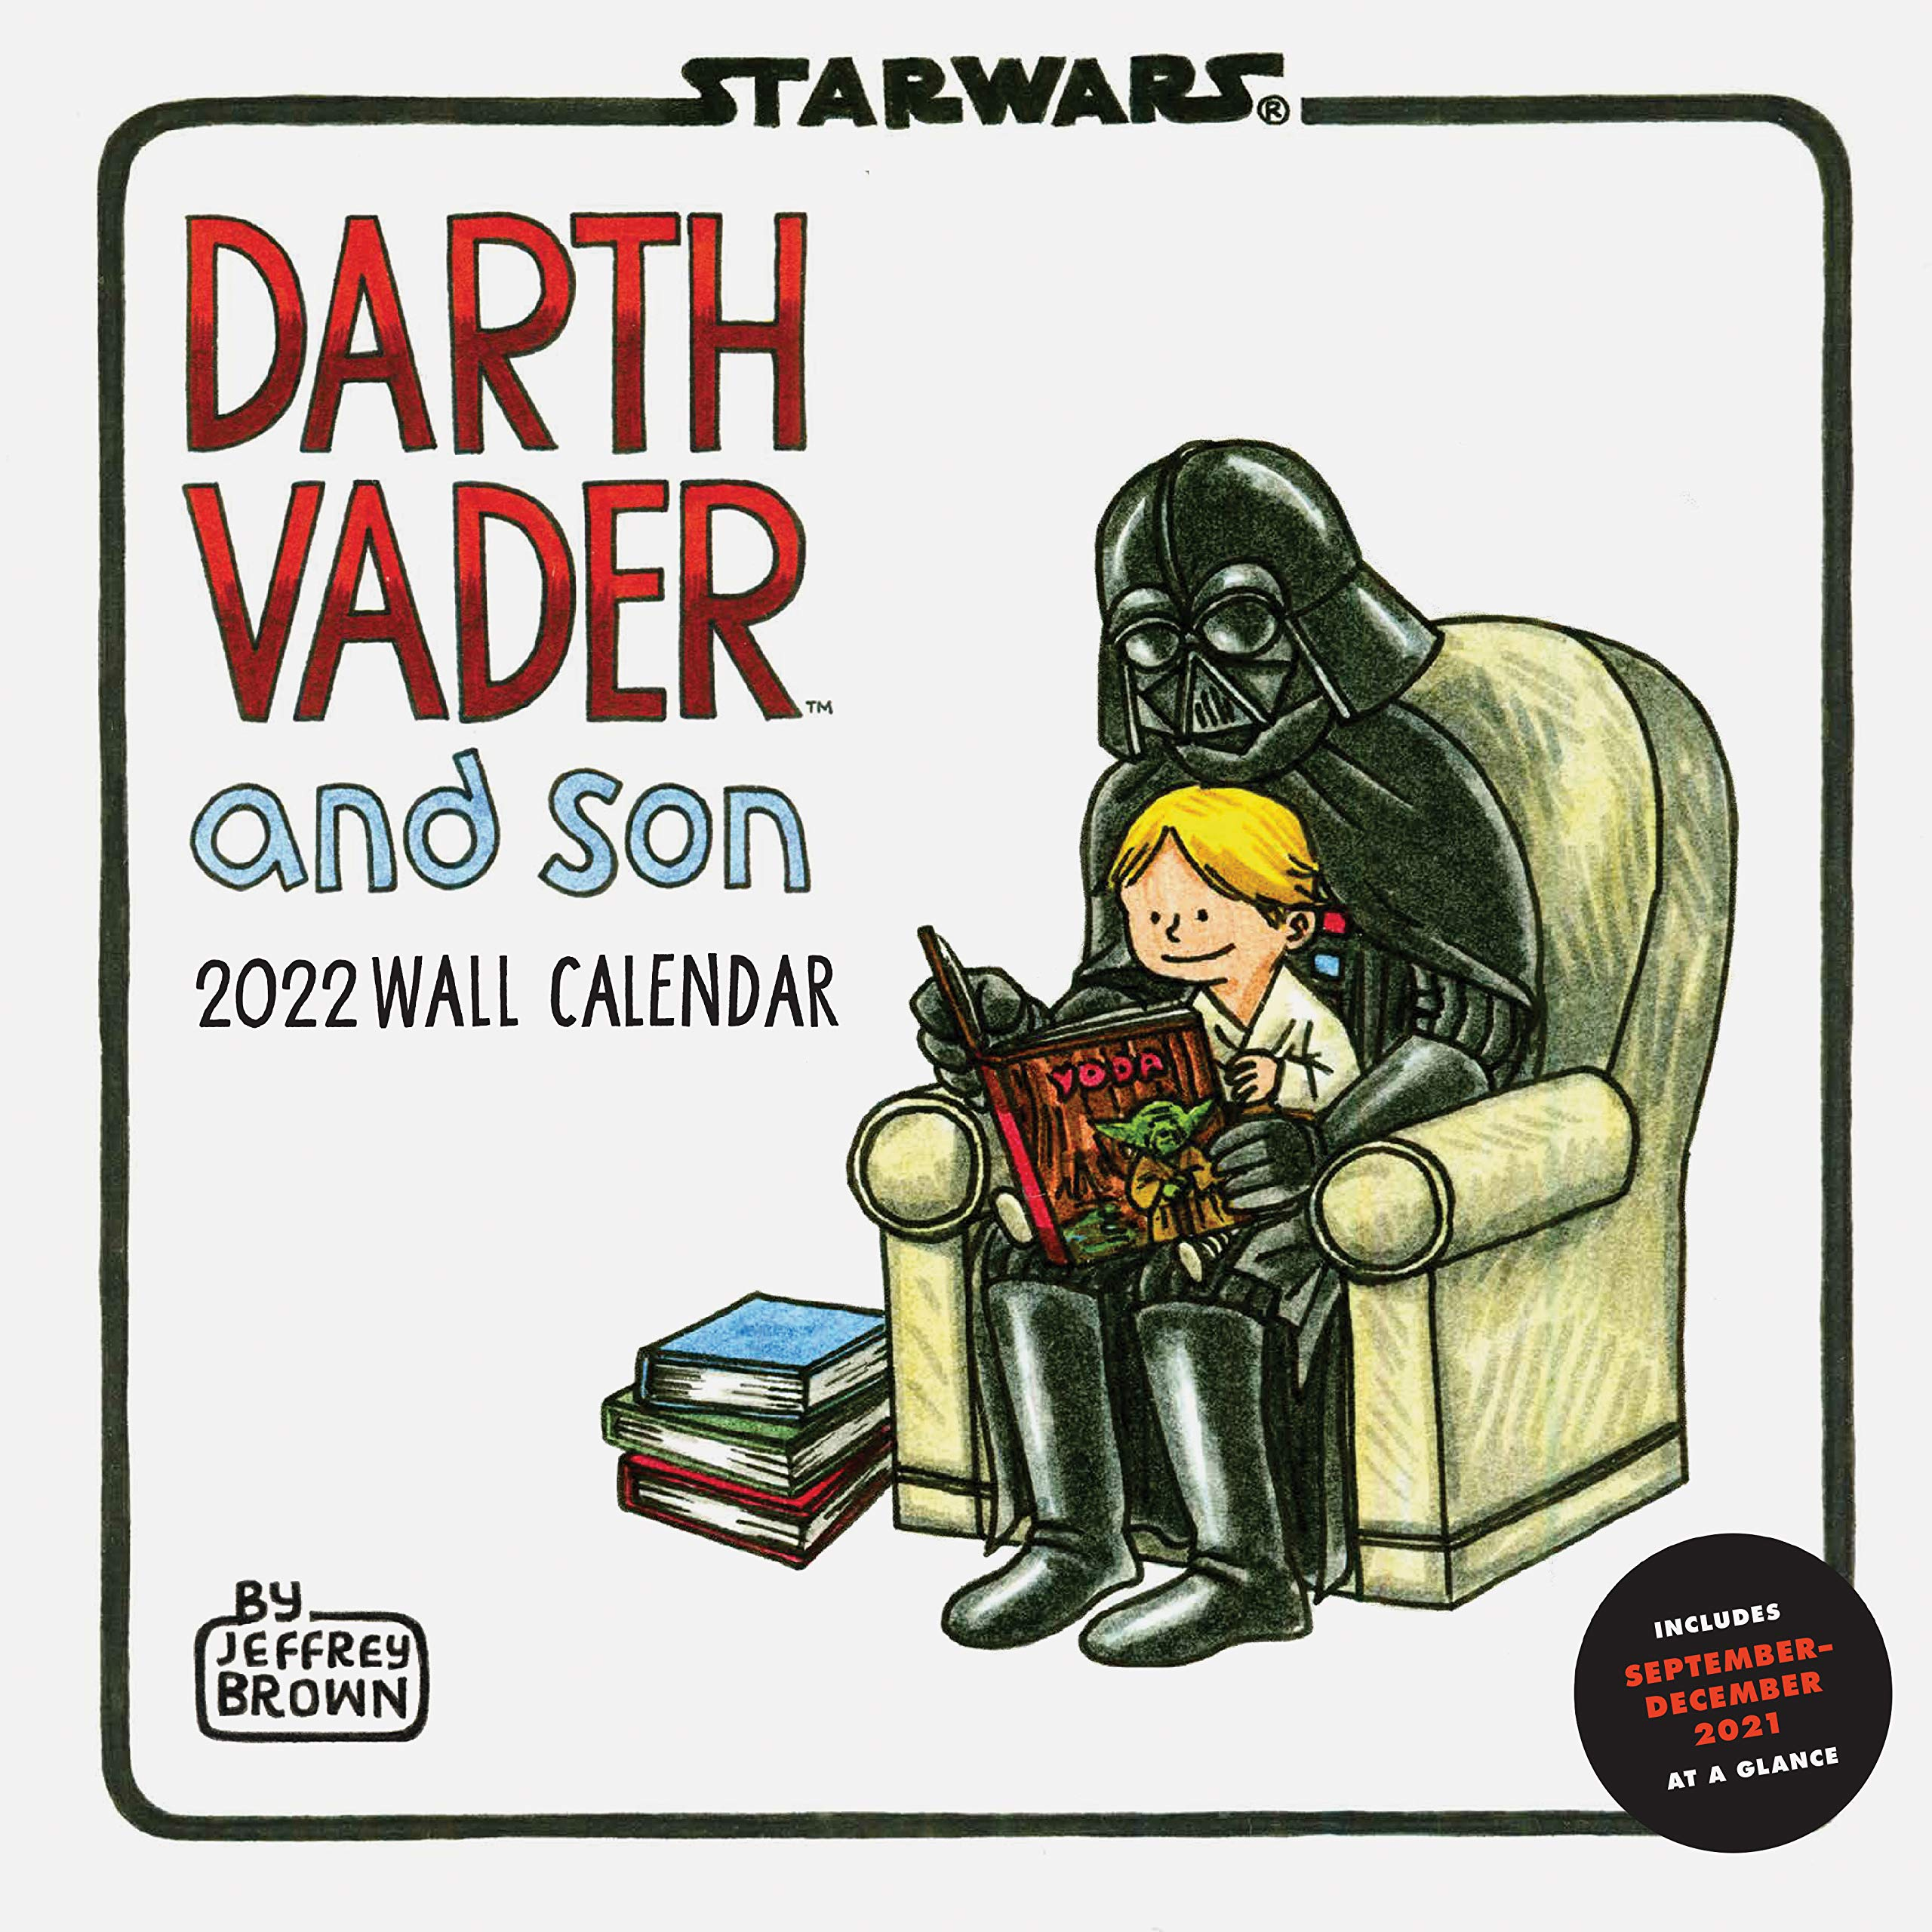 Star Wars Calendar 2022.Star Wars Darth Vader And Son 2022 Wall Calendar Brown Jeffrey Lucasfilm Ltd 9781797202877 Amazon Com Books